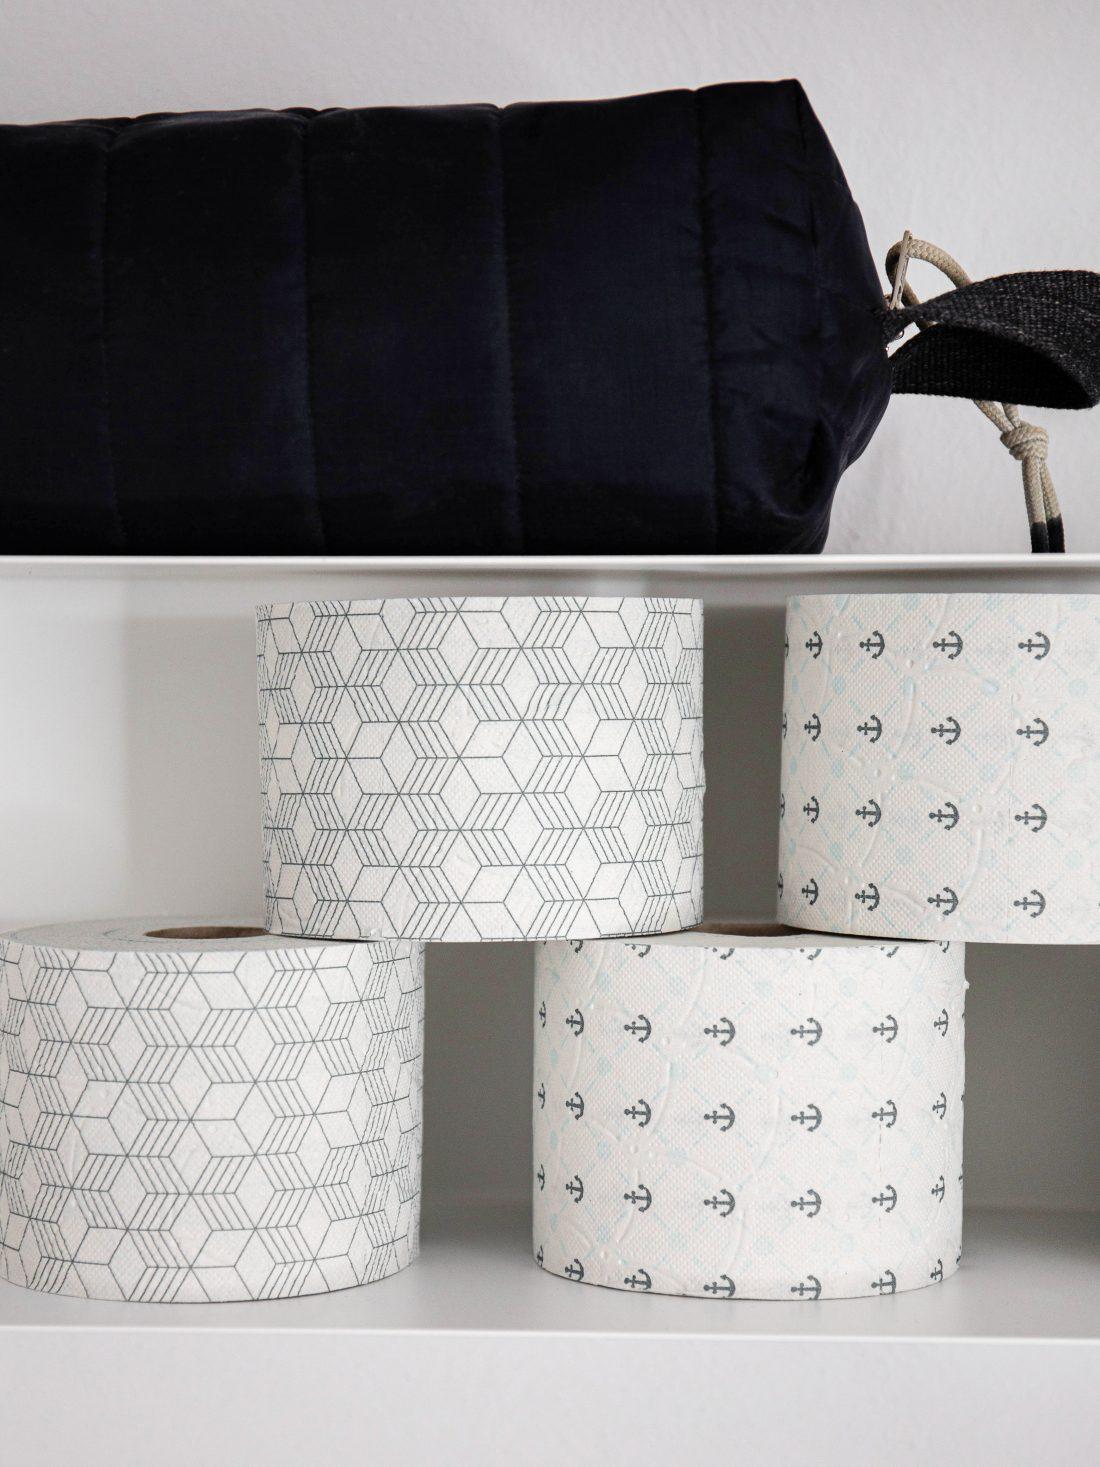 Recycling Toilettenpapier von SNYCE